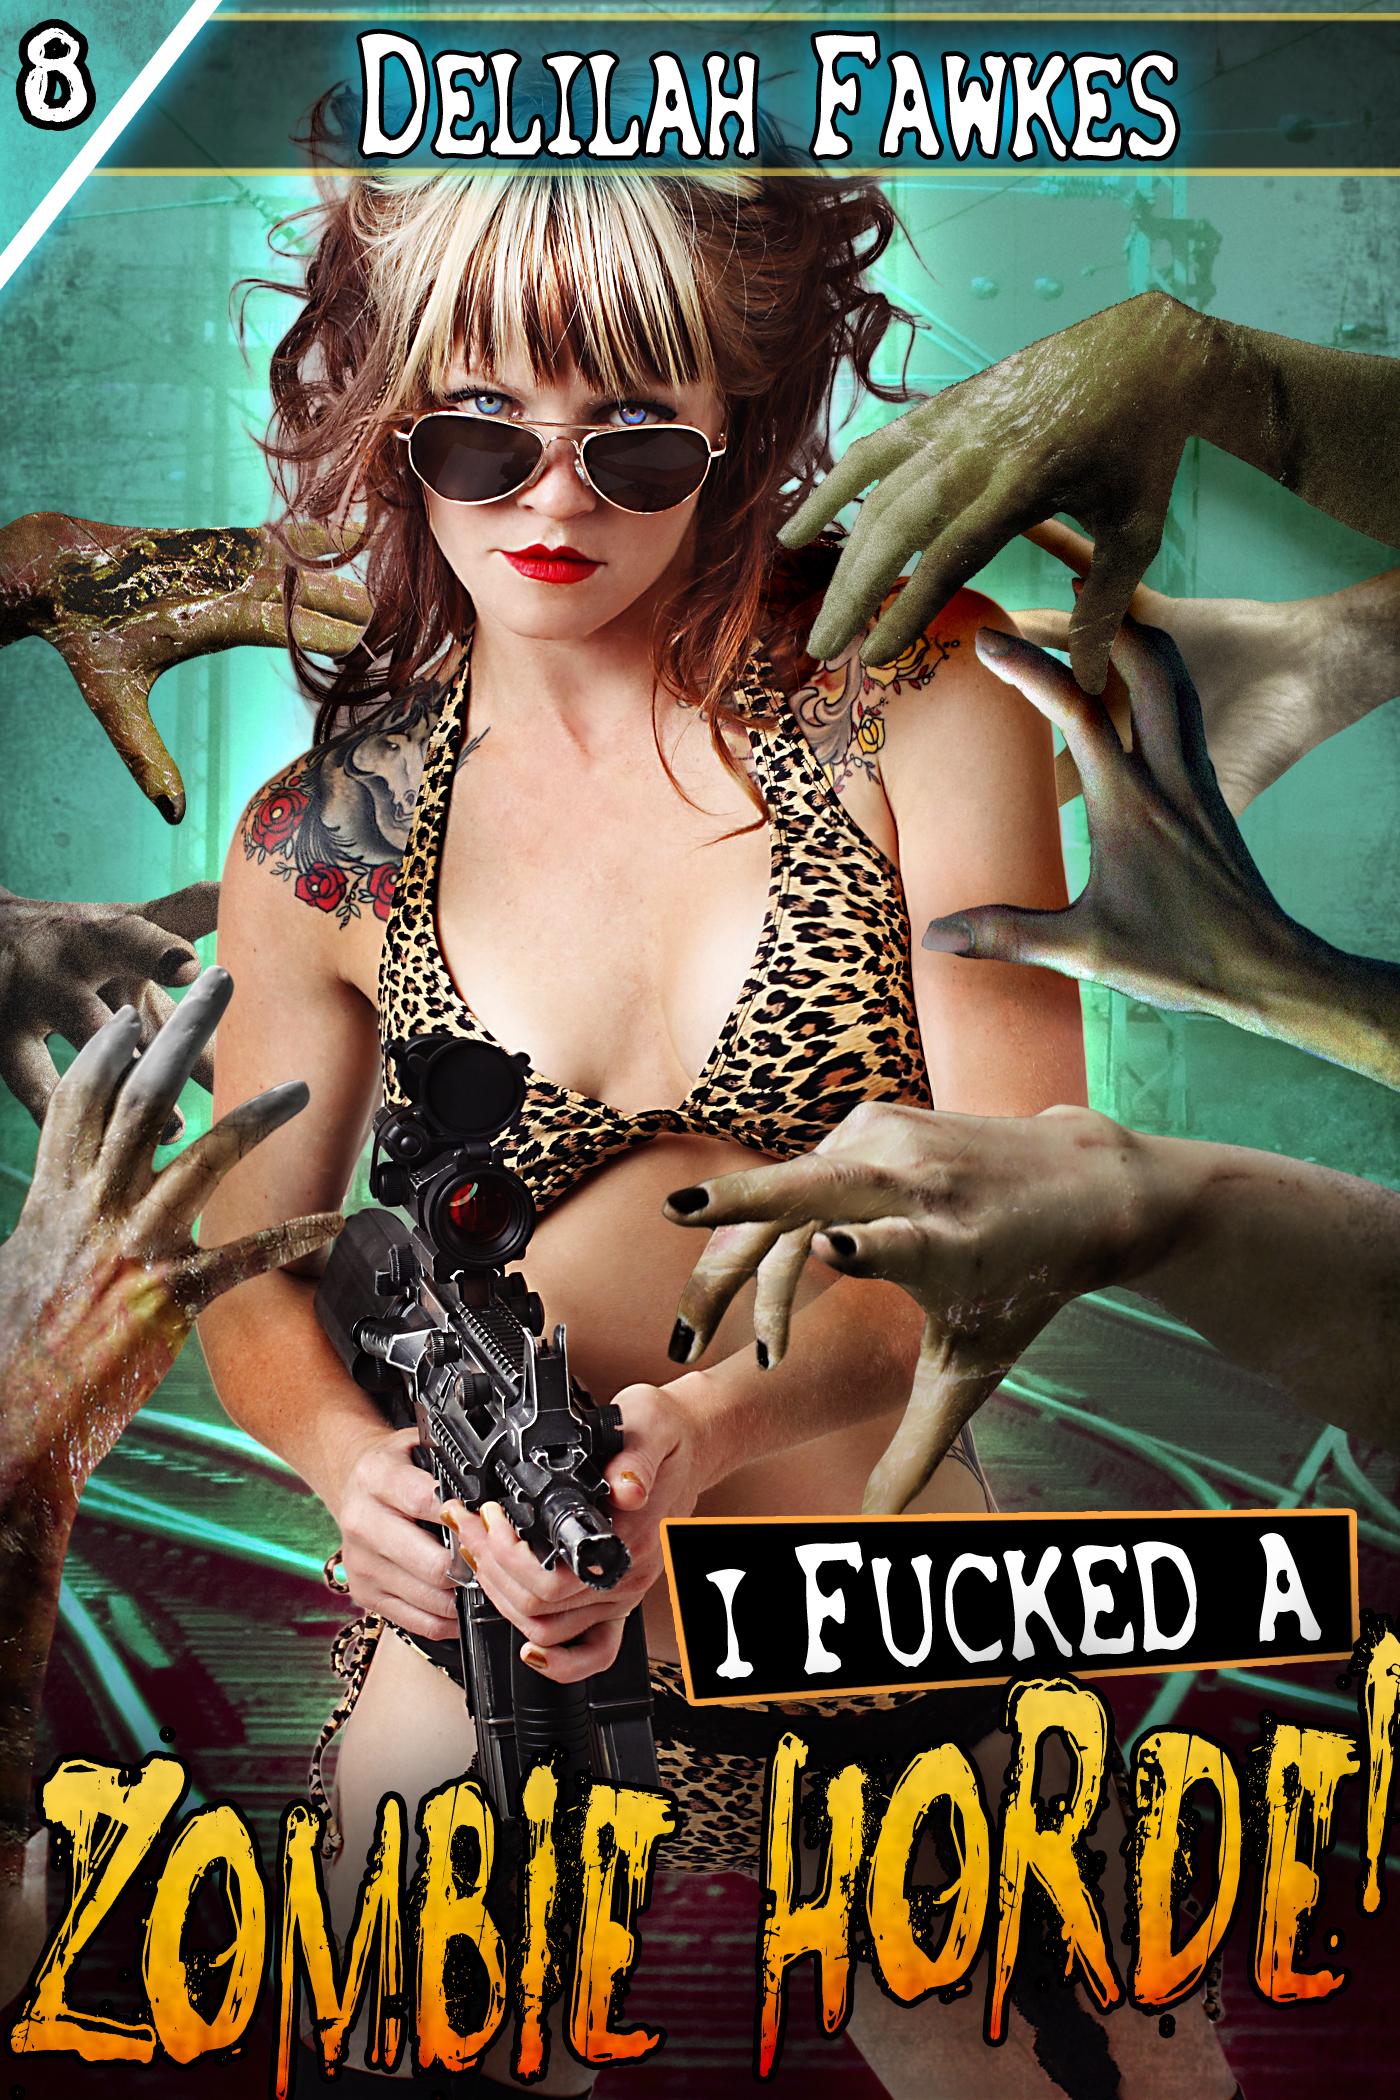 Girl fucked zombie horde fucks pictures